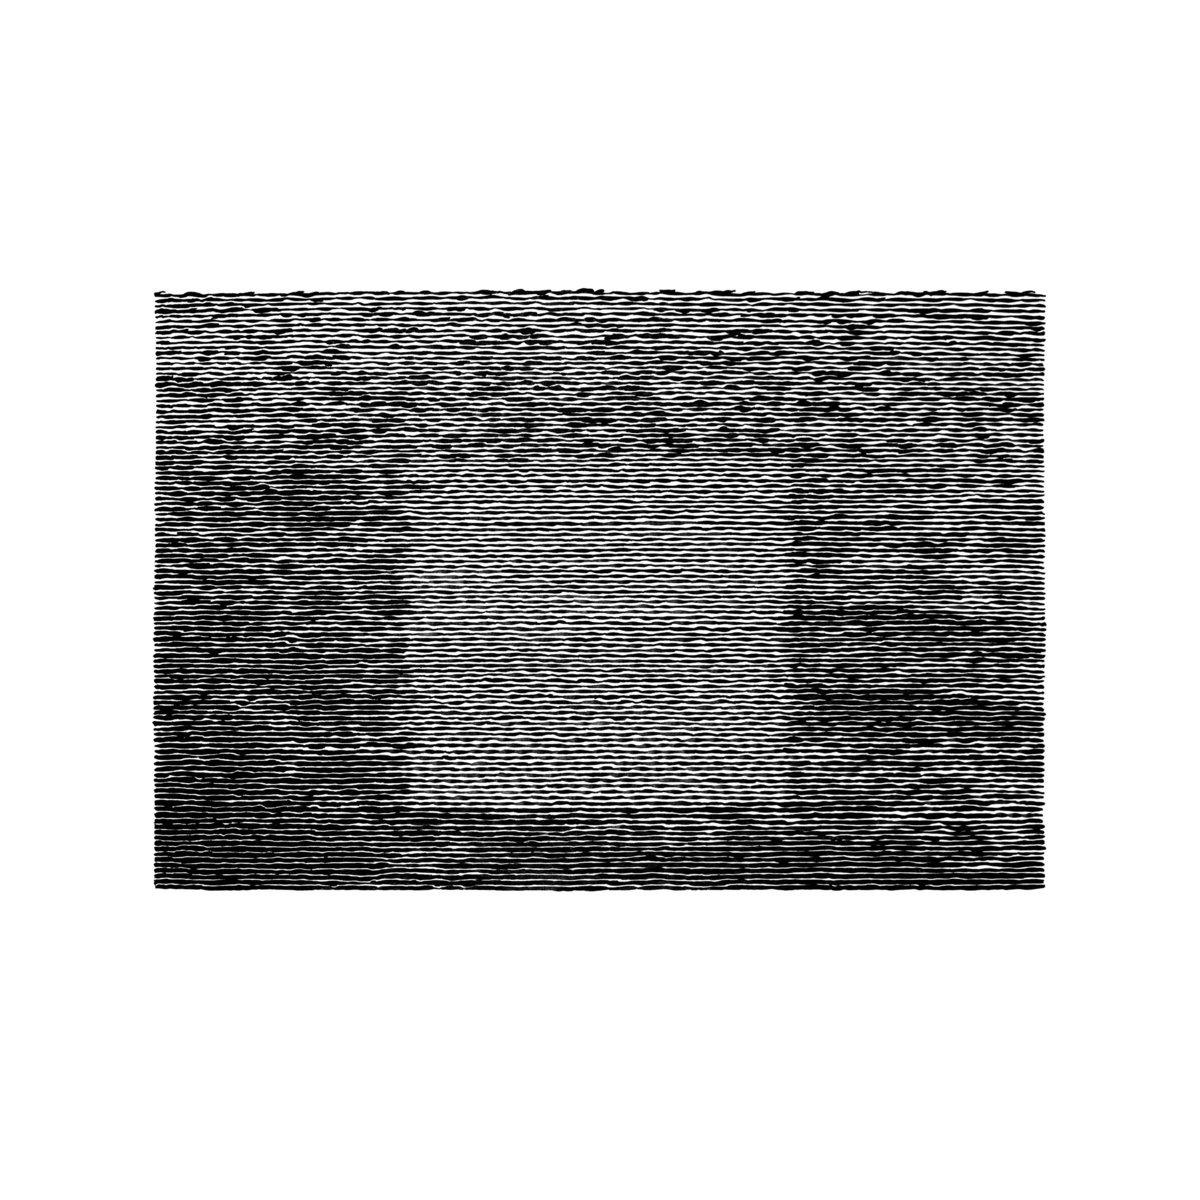 Grouper announces new album Grid Of Points; hear her rapturous new song 'Parking Lot' https://t.co/FjoG149dnO https://t.co/tSVwTKaUv9